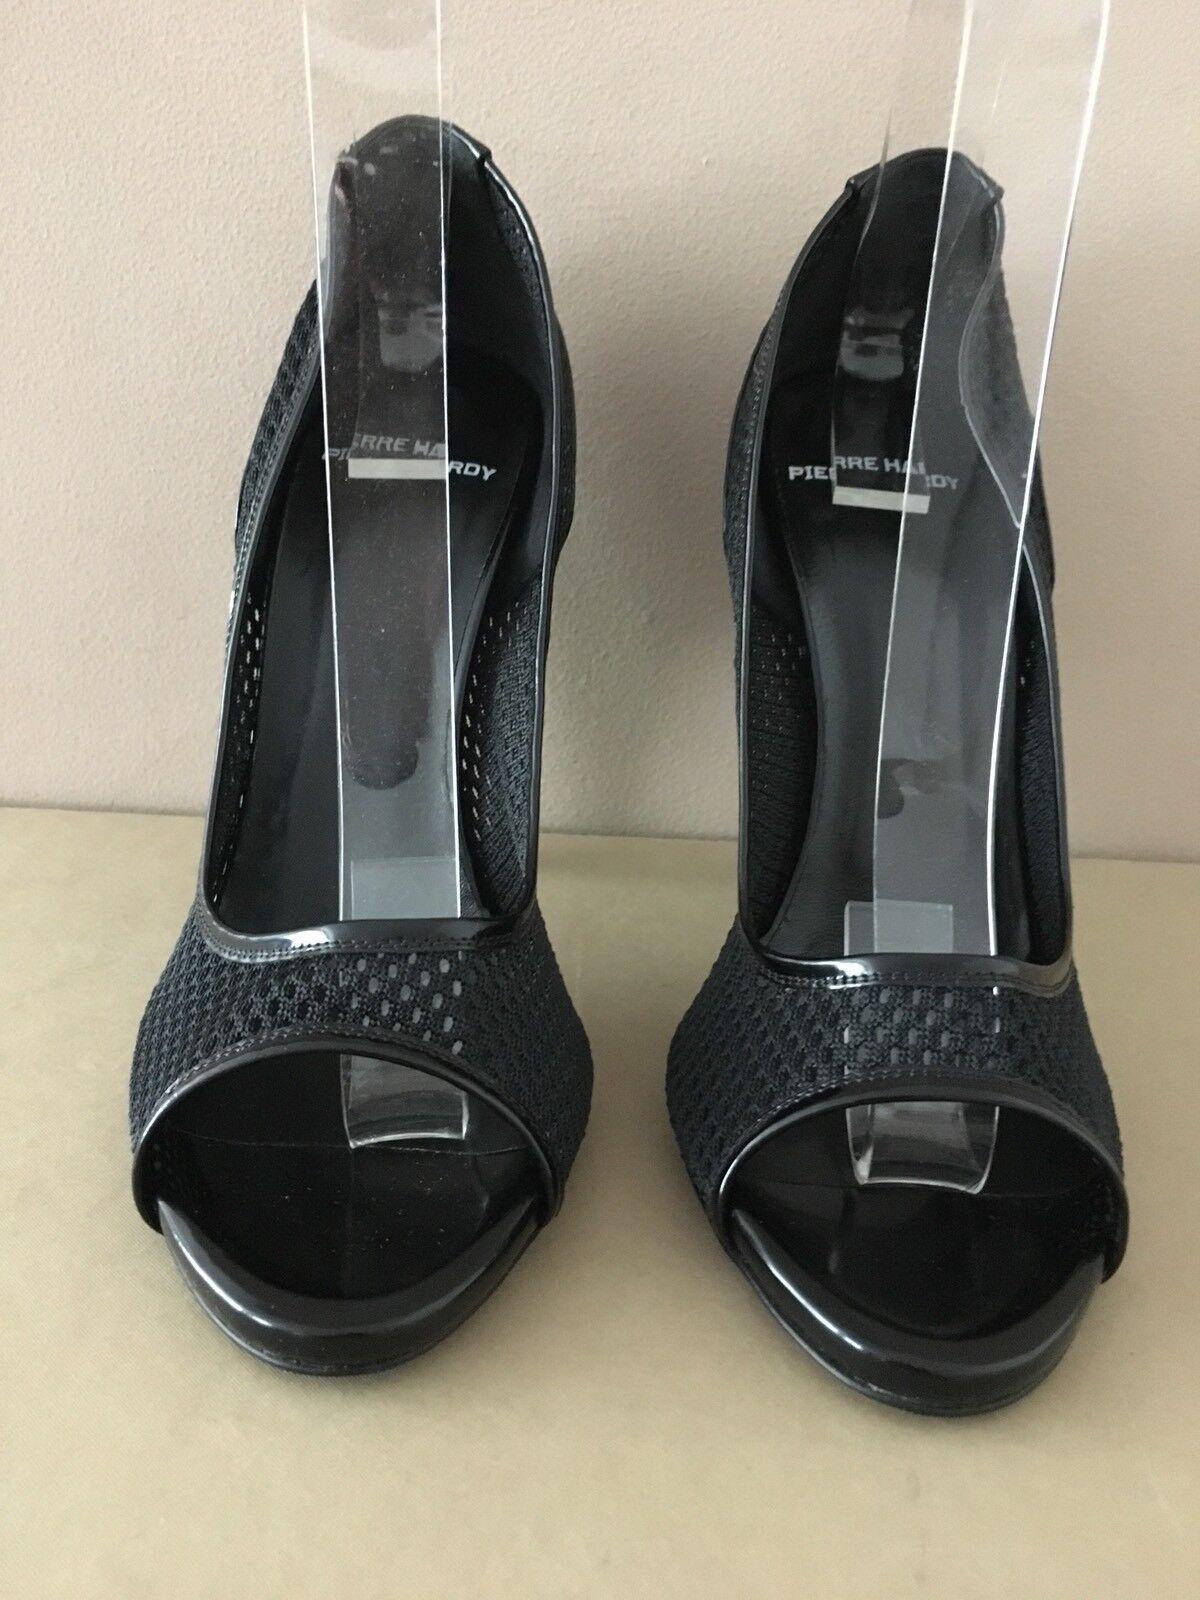 Pierre Hardy Ladies Black Polished Calf Fishnet Open Toe shoes Size 40